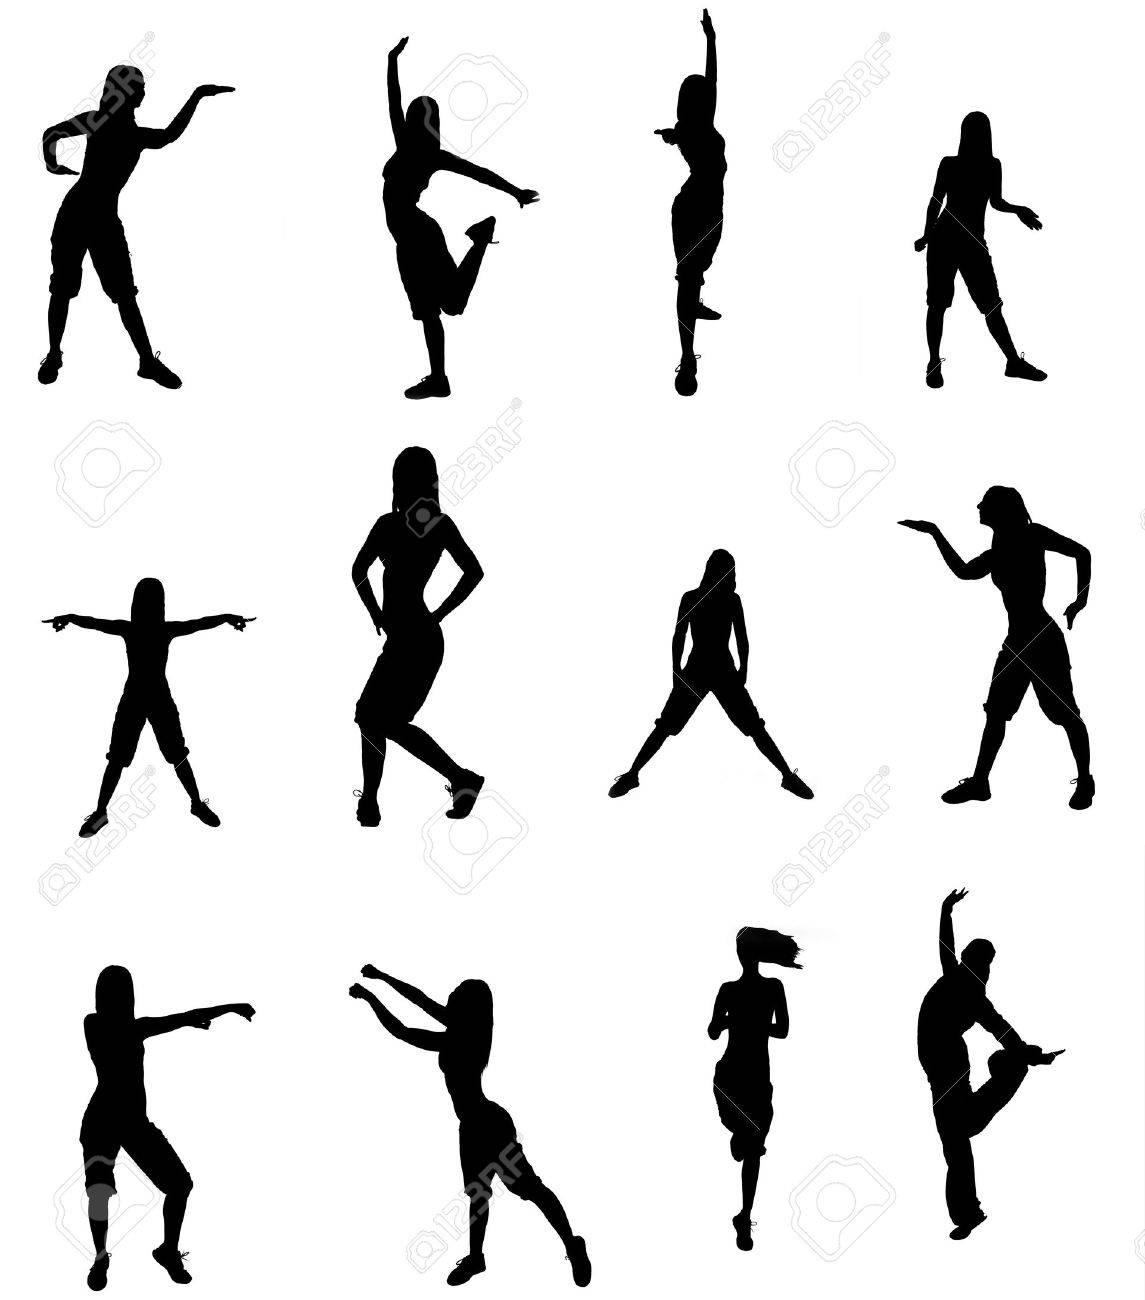 Woman Silhouette Logo Silhouette of a Dancer Woman